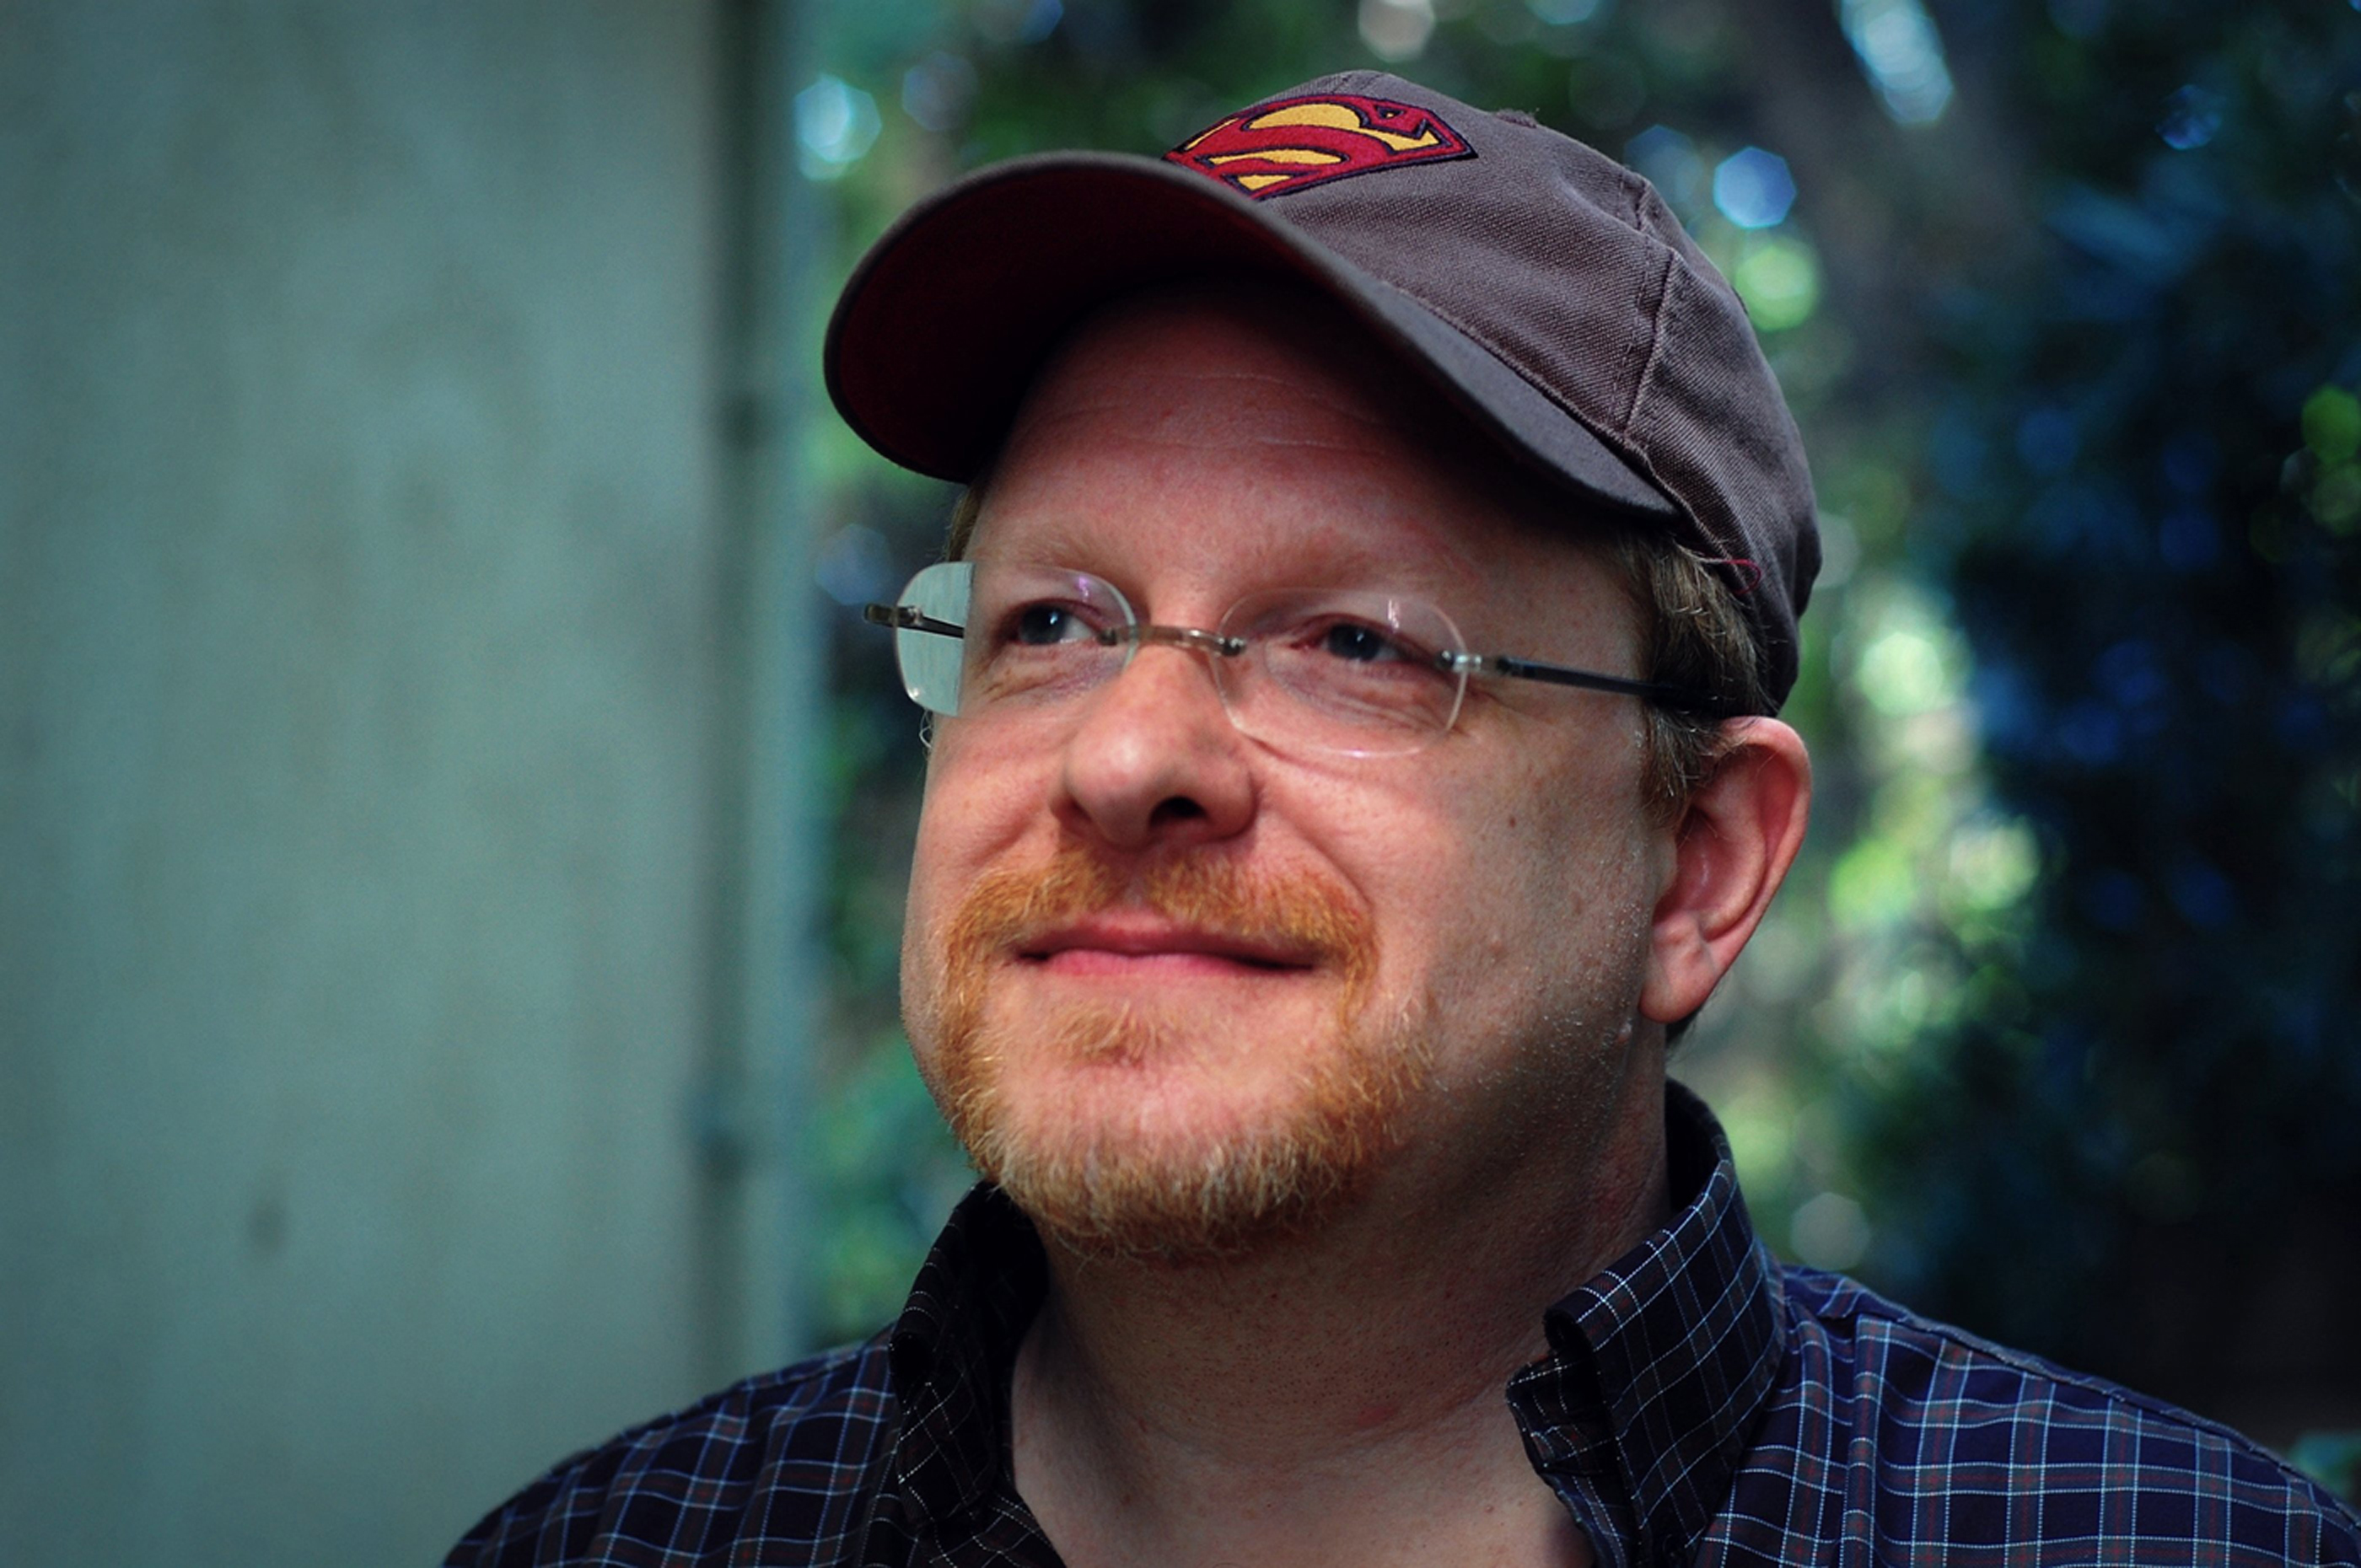 Update: Daredevil veteran Mark Waid raises $75k to defray costs of Comicsgate lawsuit